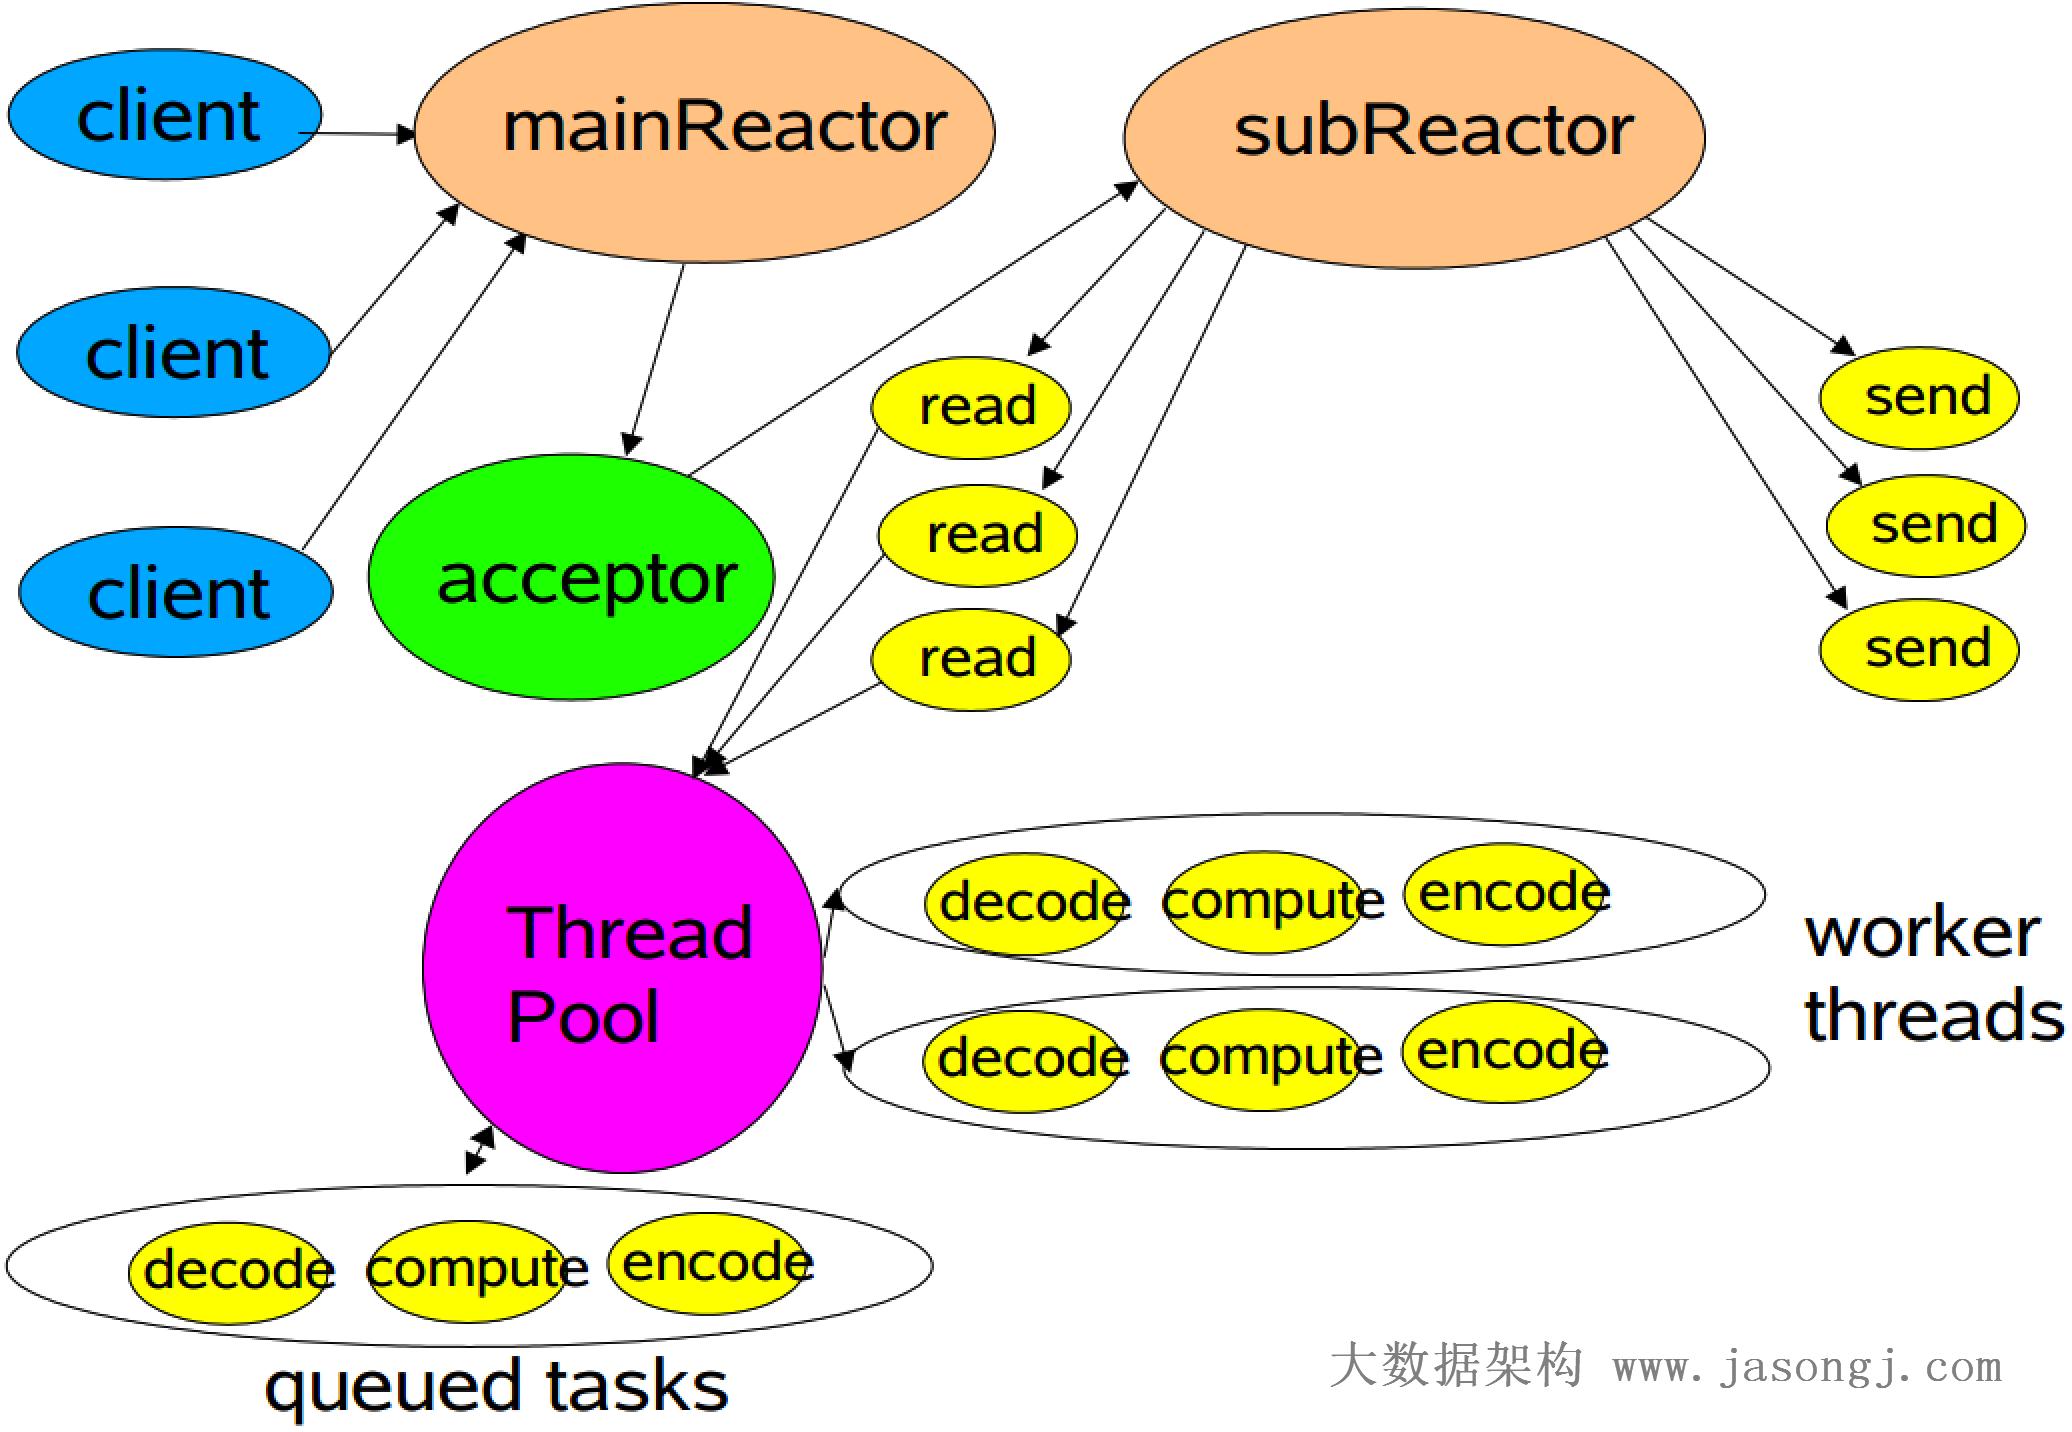 多Reactor